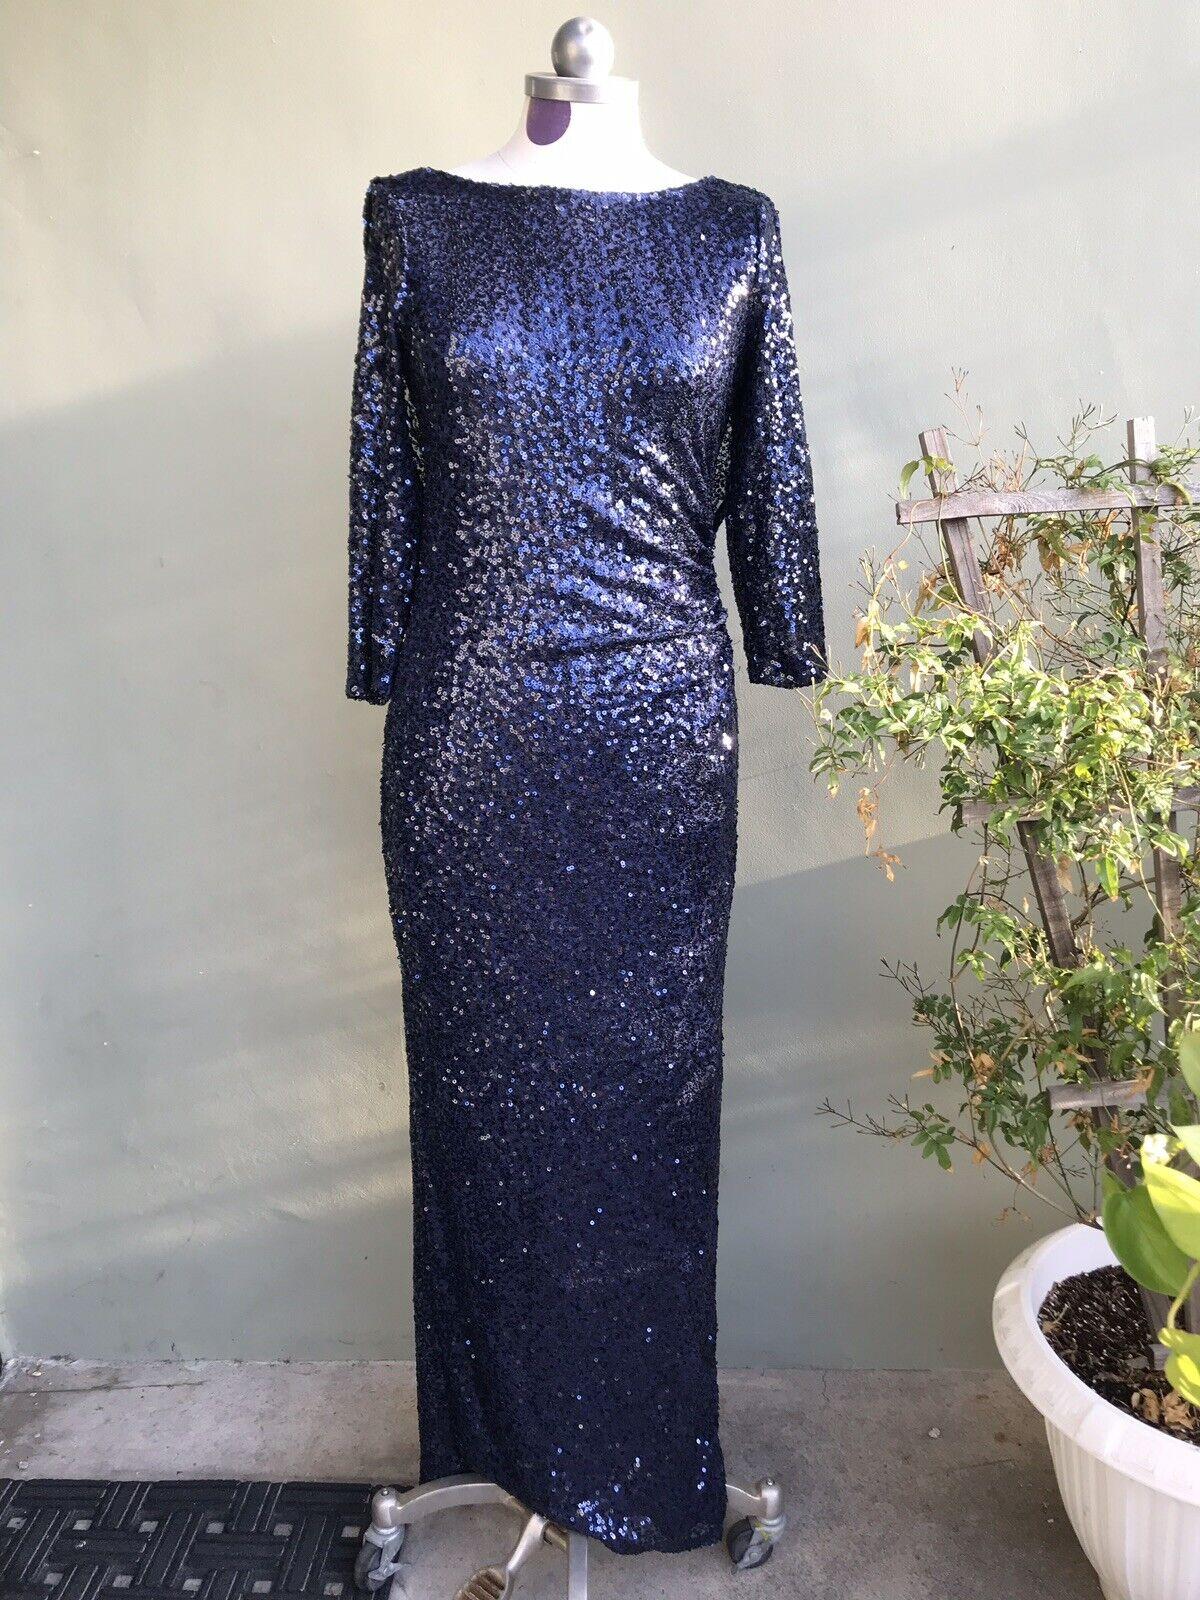 NWT MARINA Scoop Back Cutout Navy Blau Dress Sequin Formal Long Sleeve Größe 4